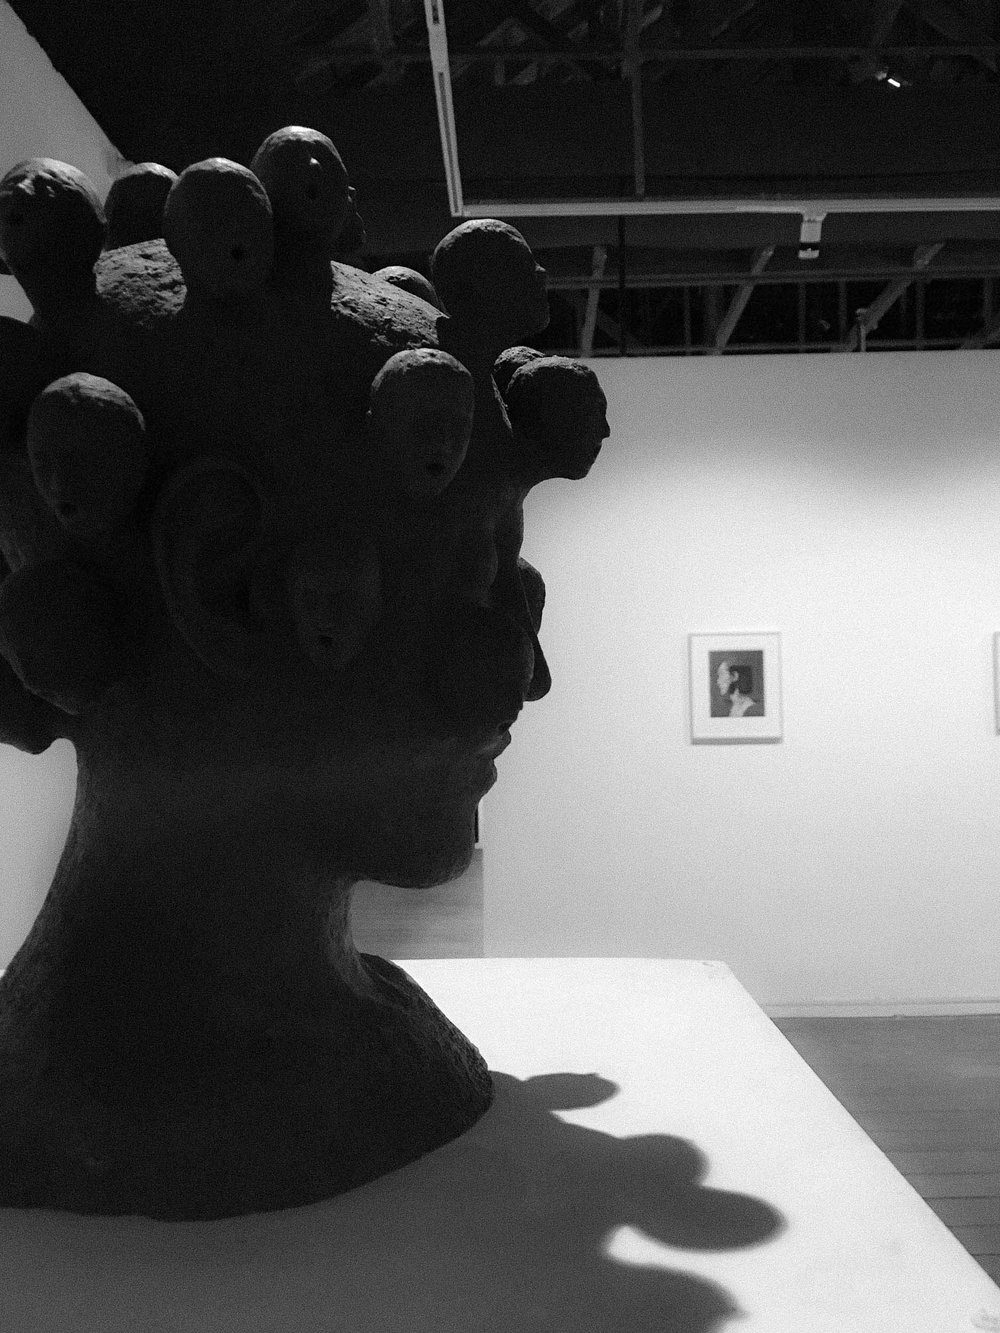 Sindhur_Photography_Kochi Muziris Biennale -2019-38.JPG